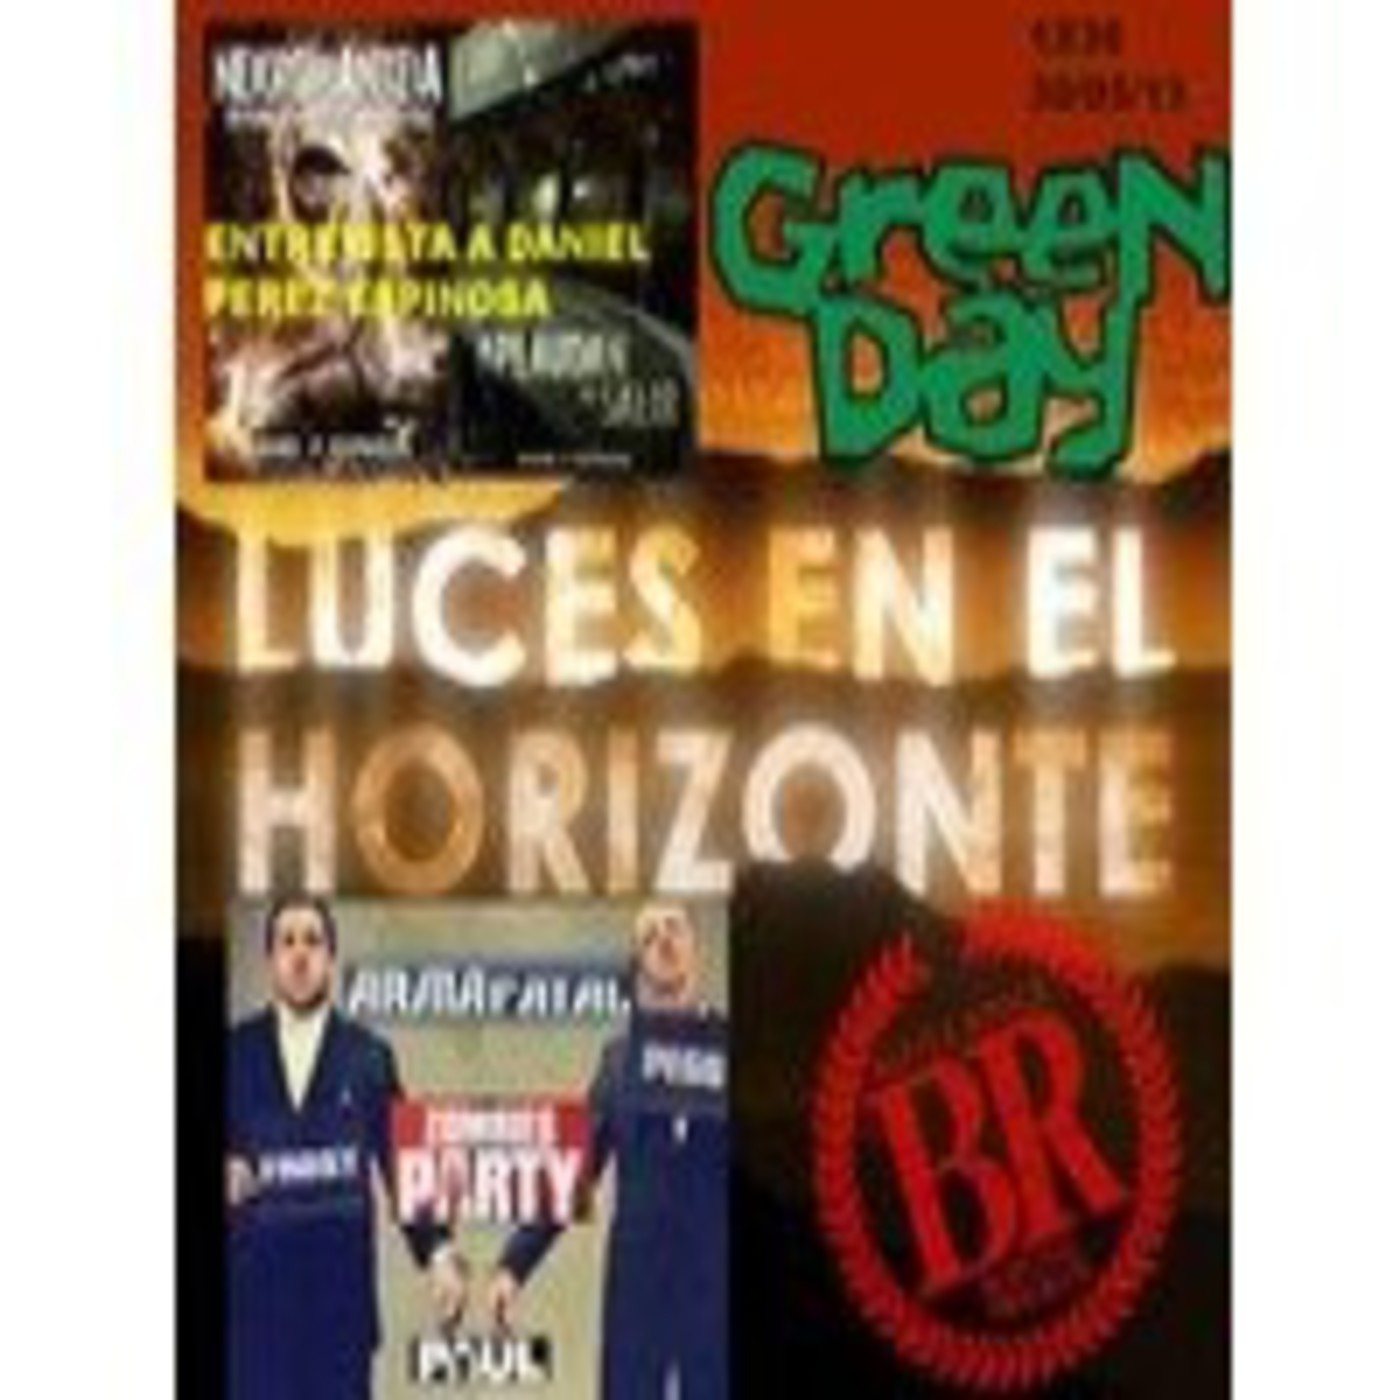 Luces en el Horizonte 1x36 - Battle Royale, Green Day, Daniel P. Espinosa, Pegg & Frost: Zombies party, Arma Fatal, Paul